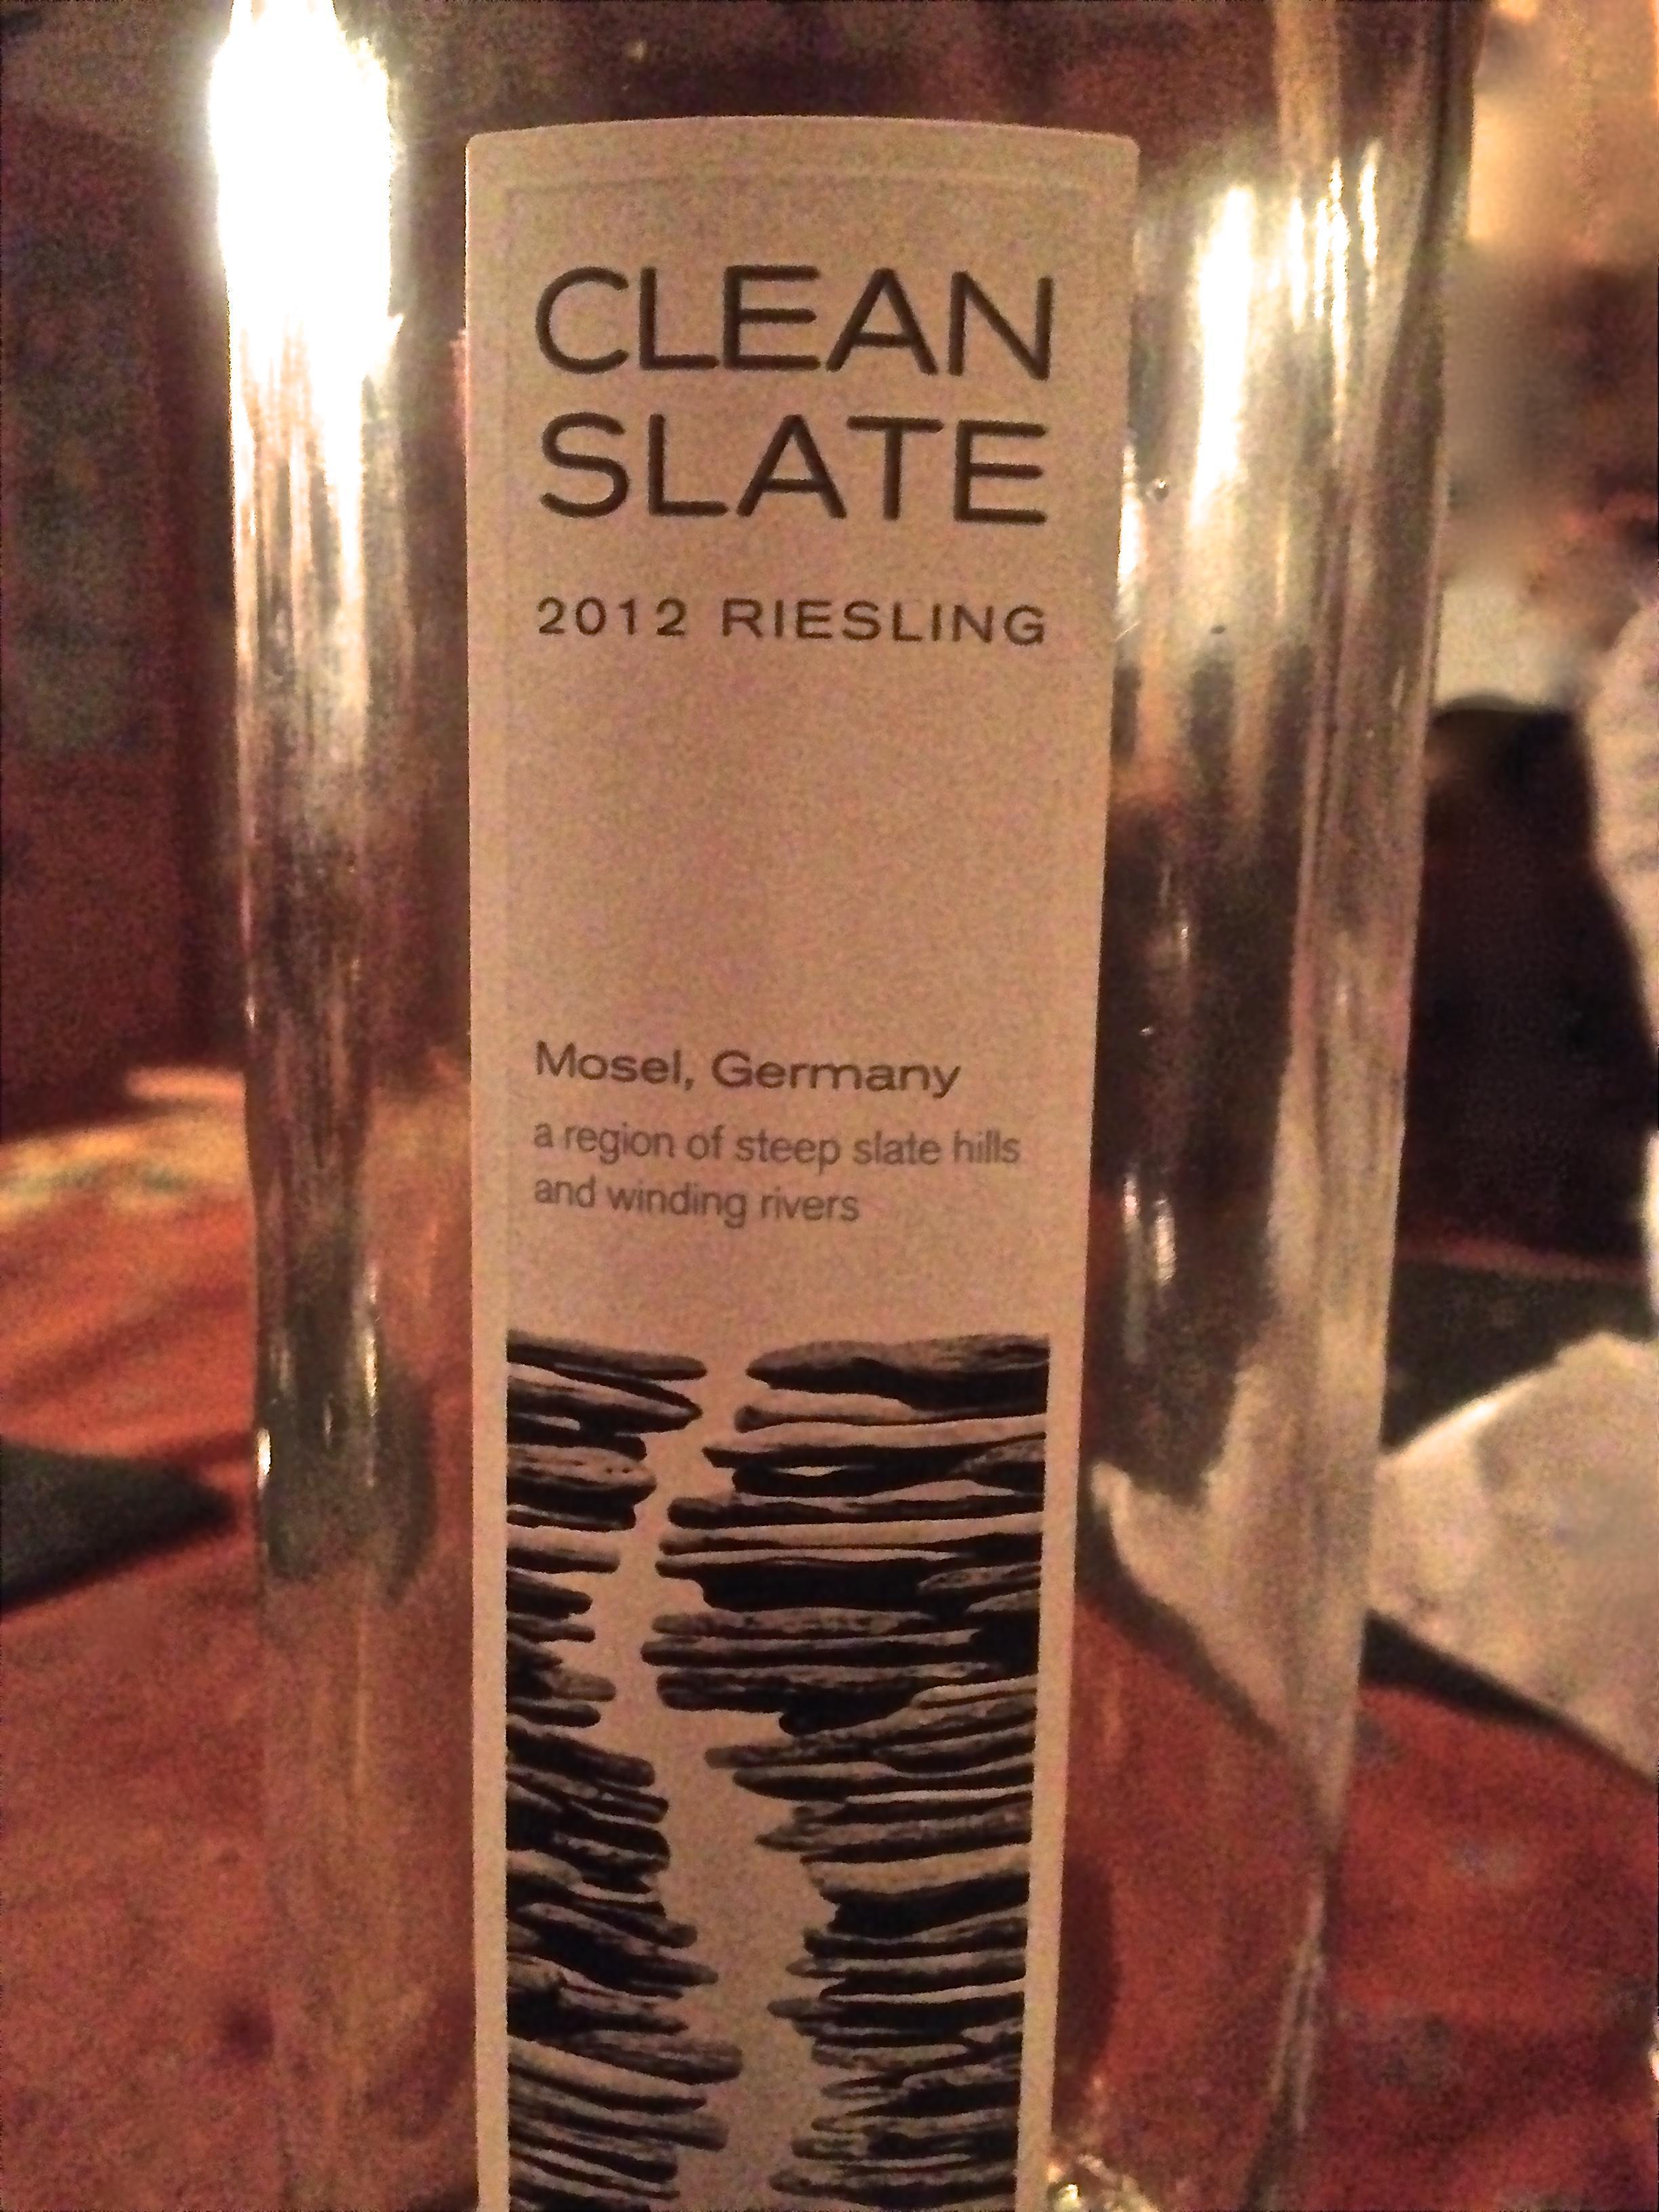 Clean Slate Riesling, Mosel, Germany 2